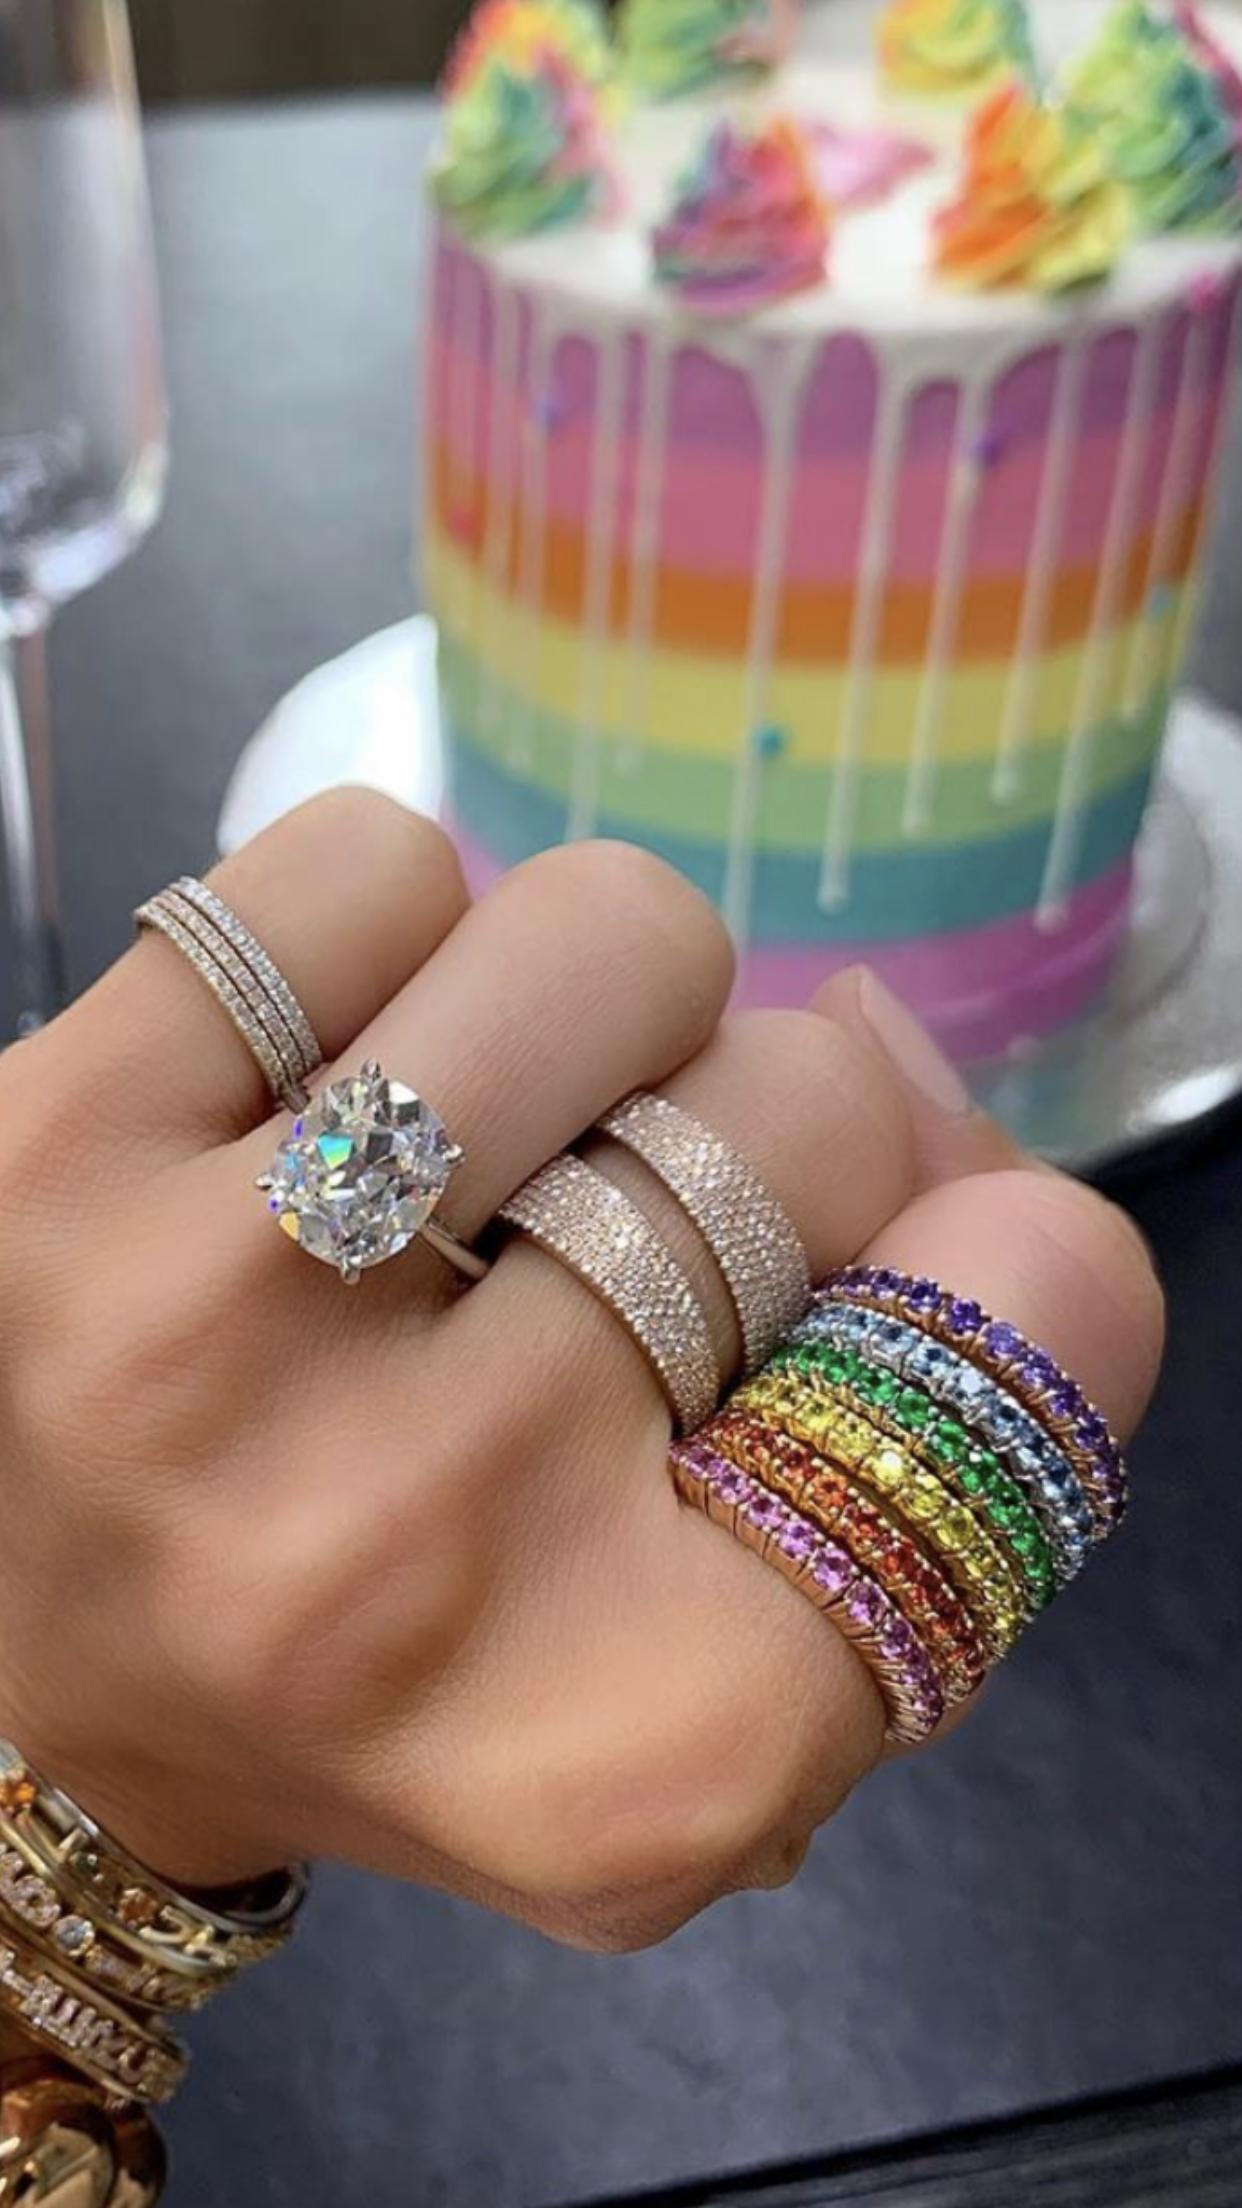 Pin by Manoj kadel on Rings Jewelry, Rings, Engagement rings